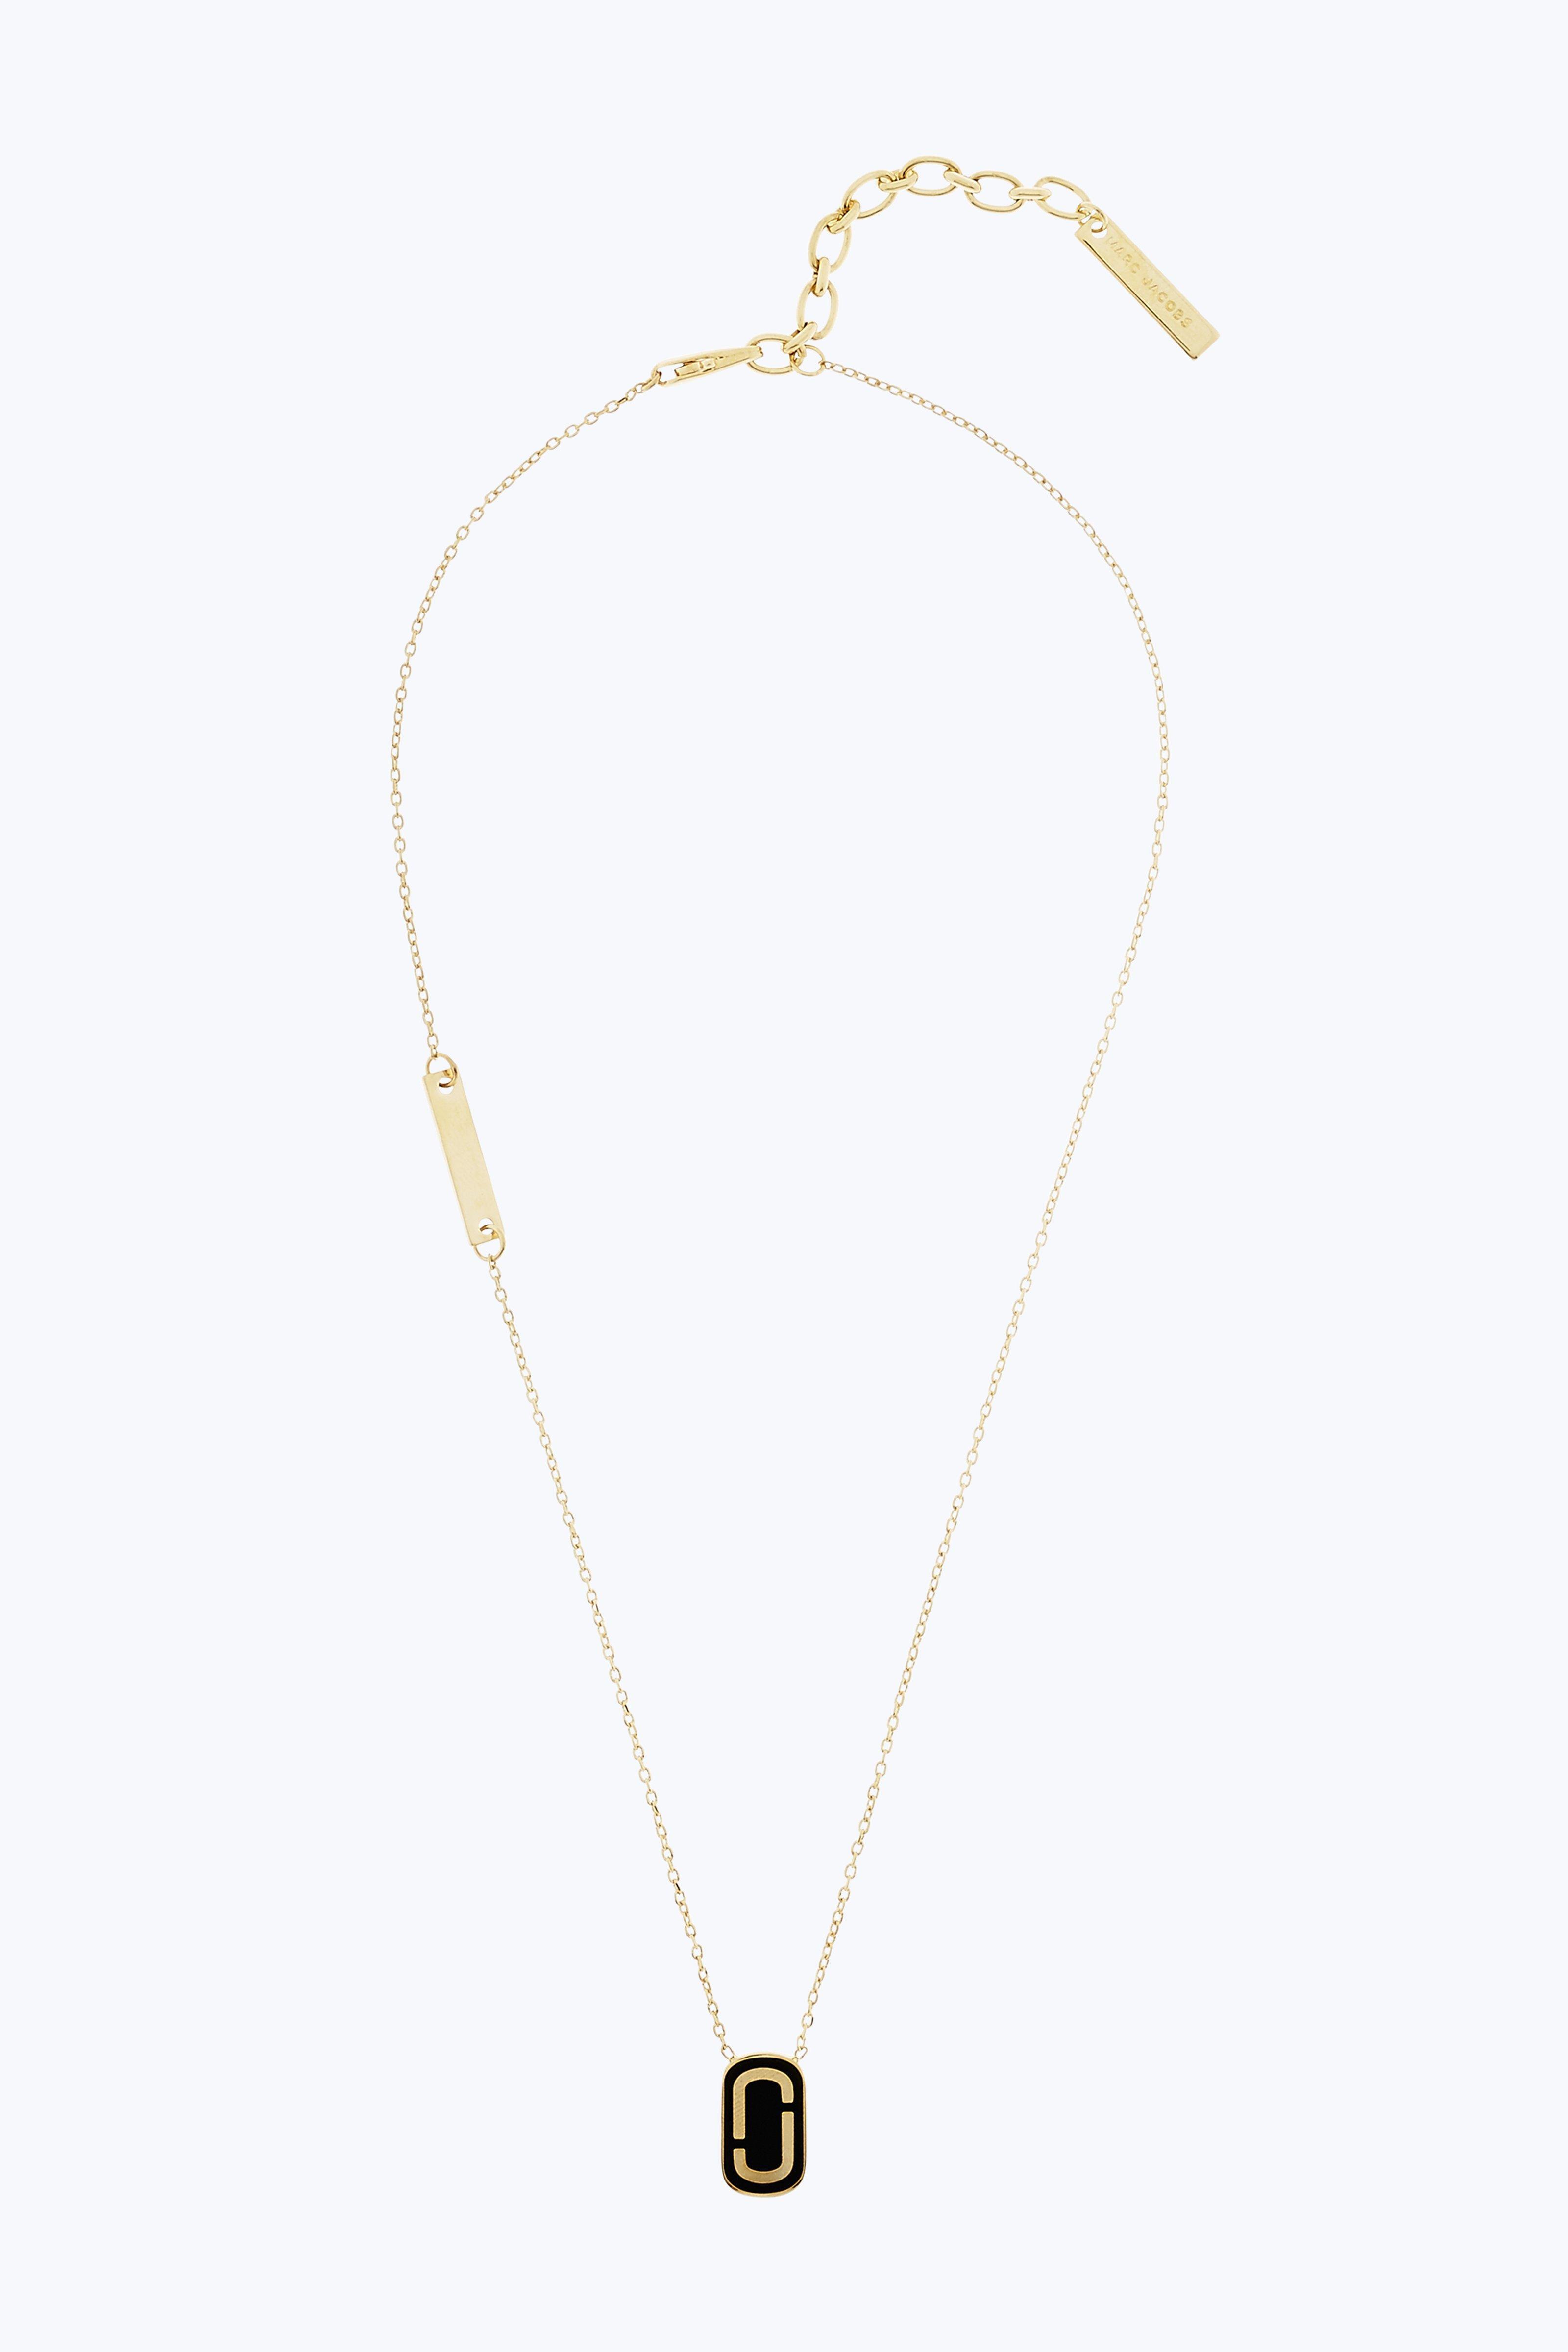 MARC JACOBS Double J Pendant Necklace in Black Gold